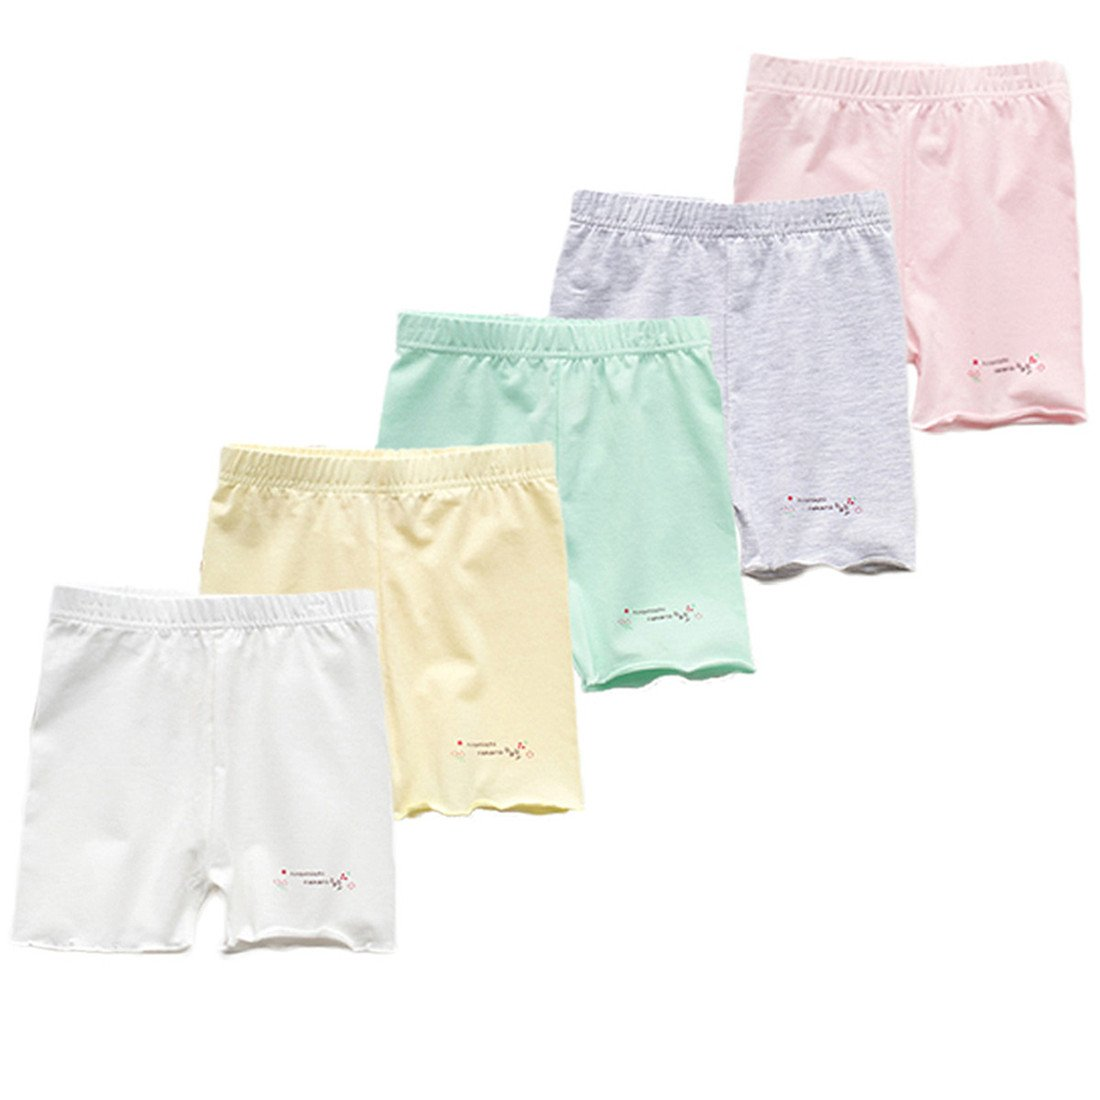 FAIRYRAIN Little Girls Kids 5 Pcs Candy Color Gymnastics Slim Elastic Safety Bike Short Panties